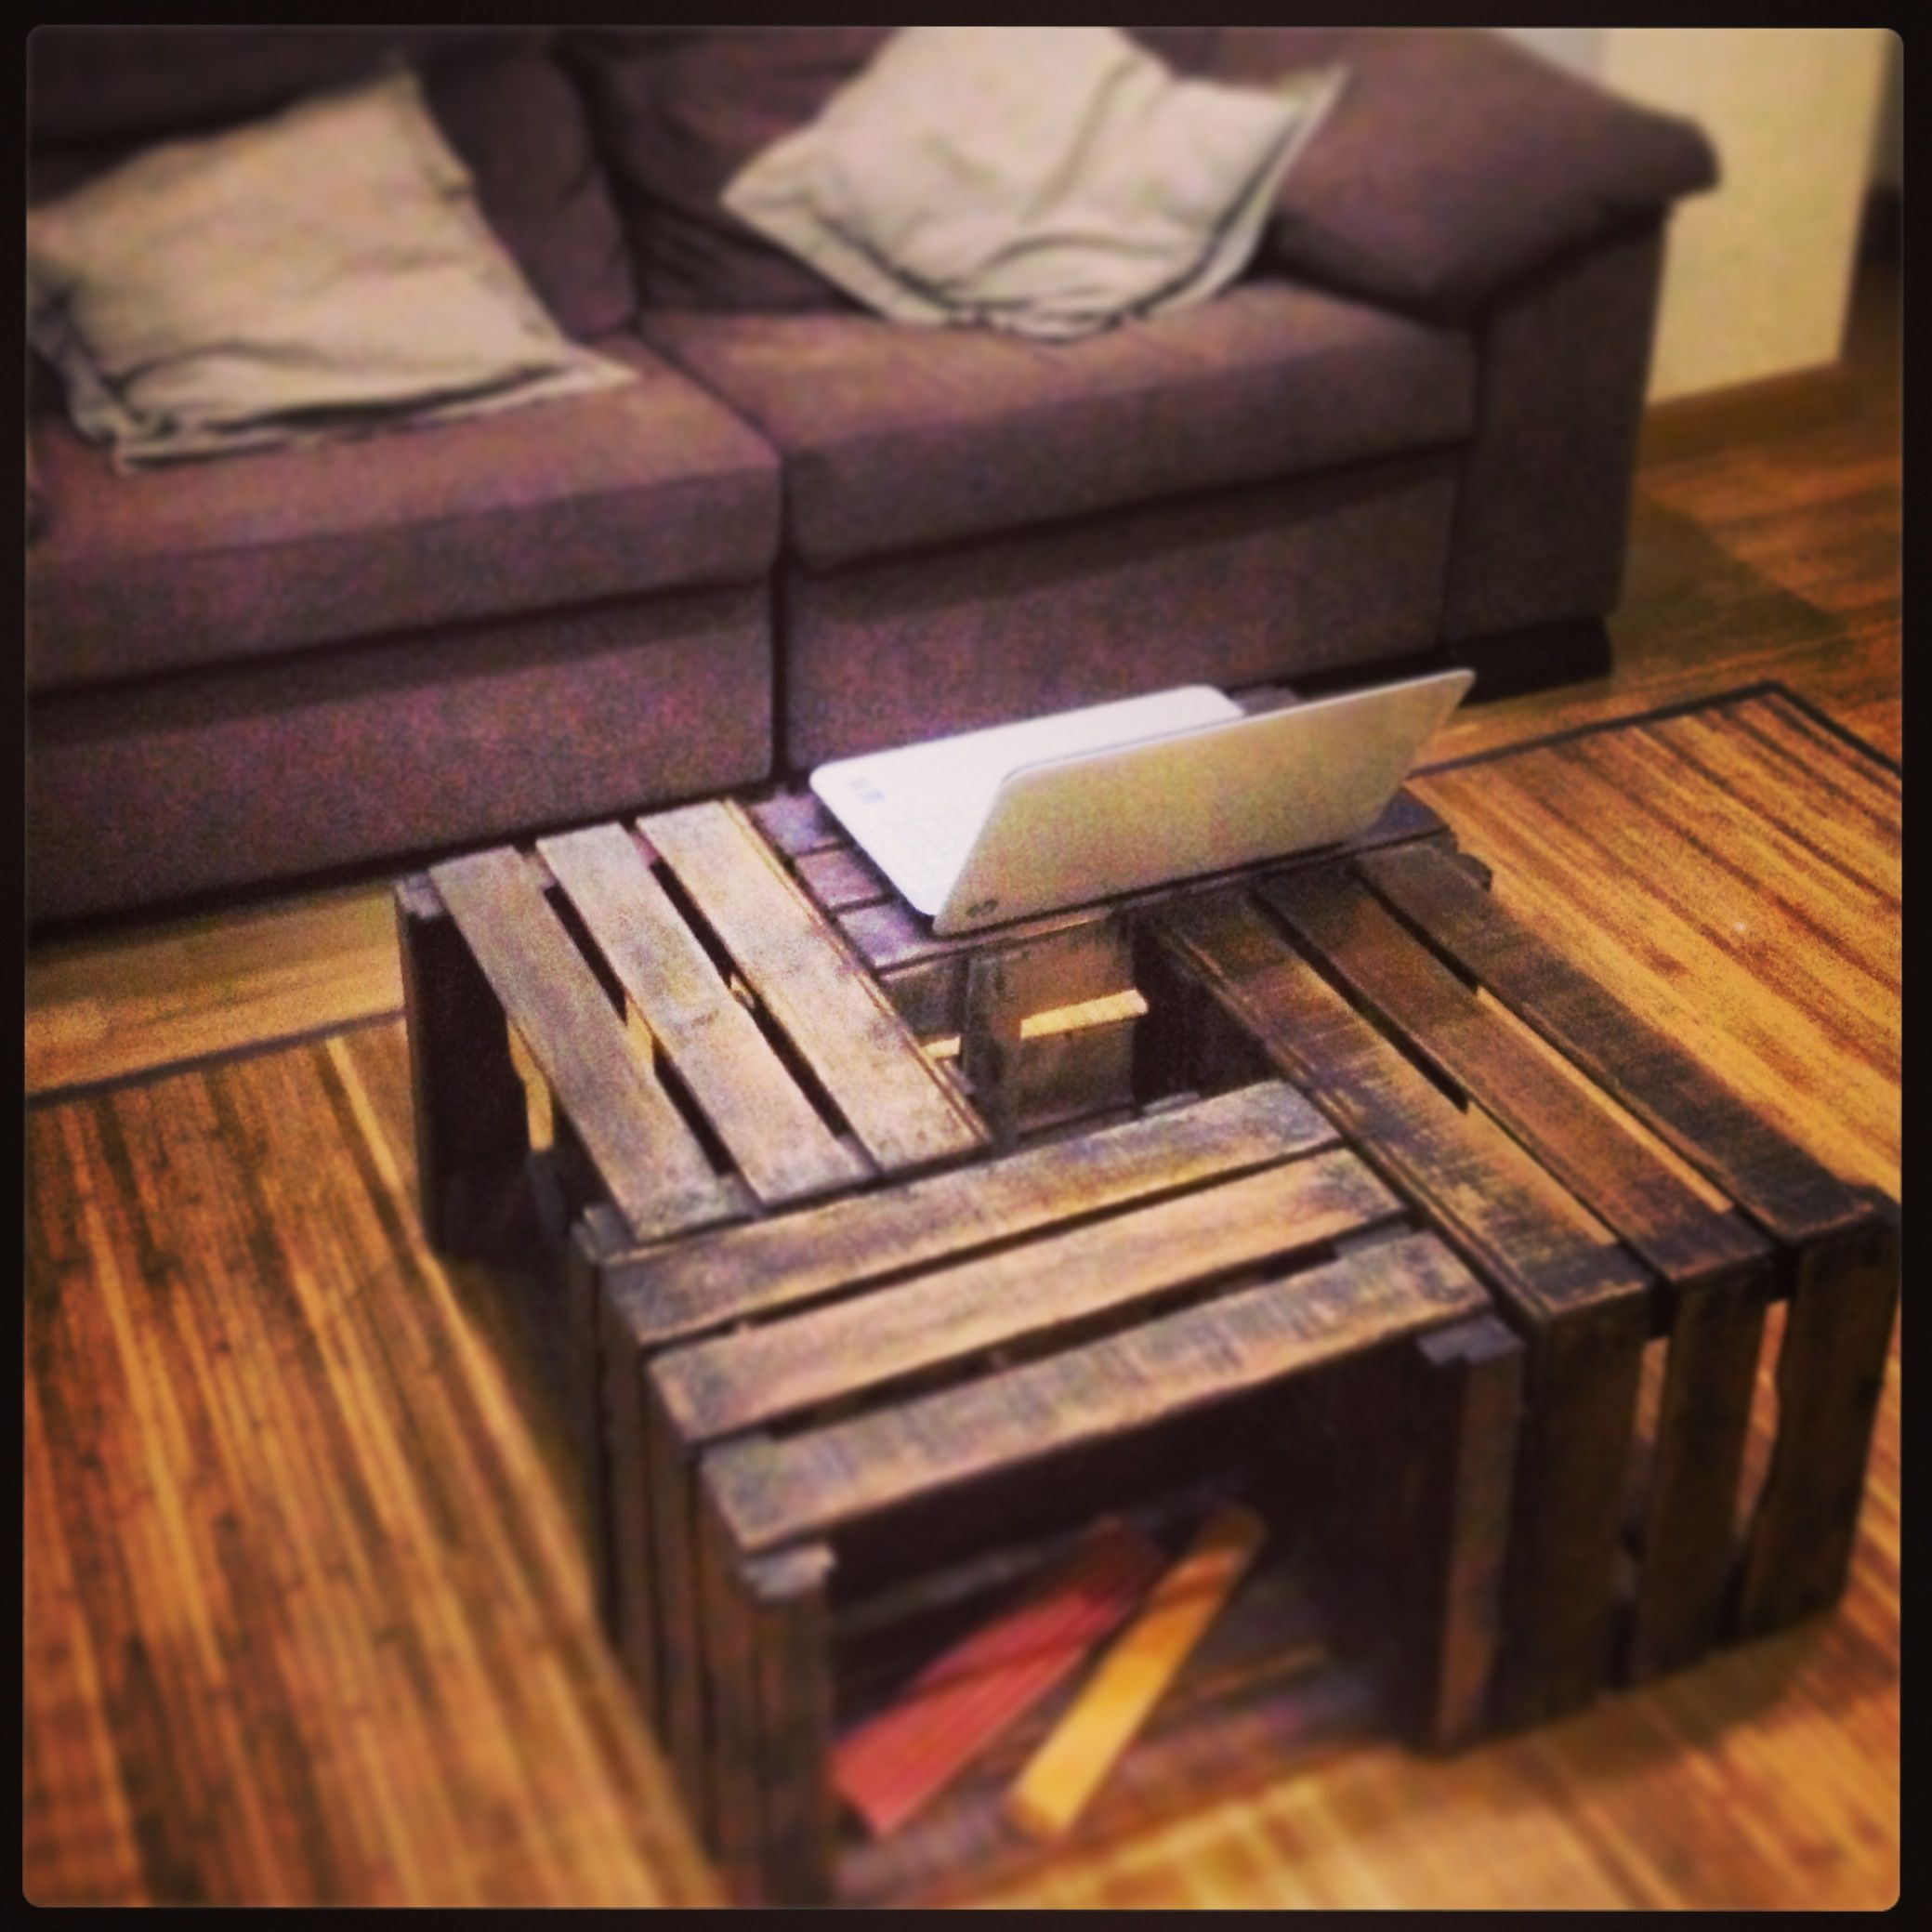 Cajas fruta madera mesa reciclada ideas casa pinterest - Mesas madera reciclada ...